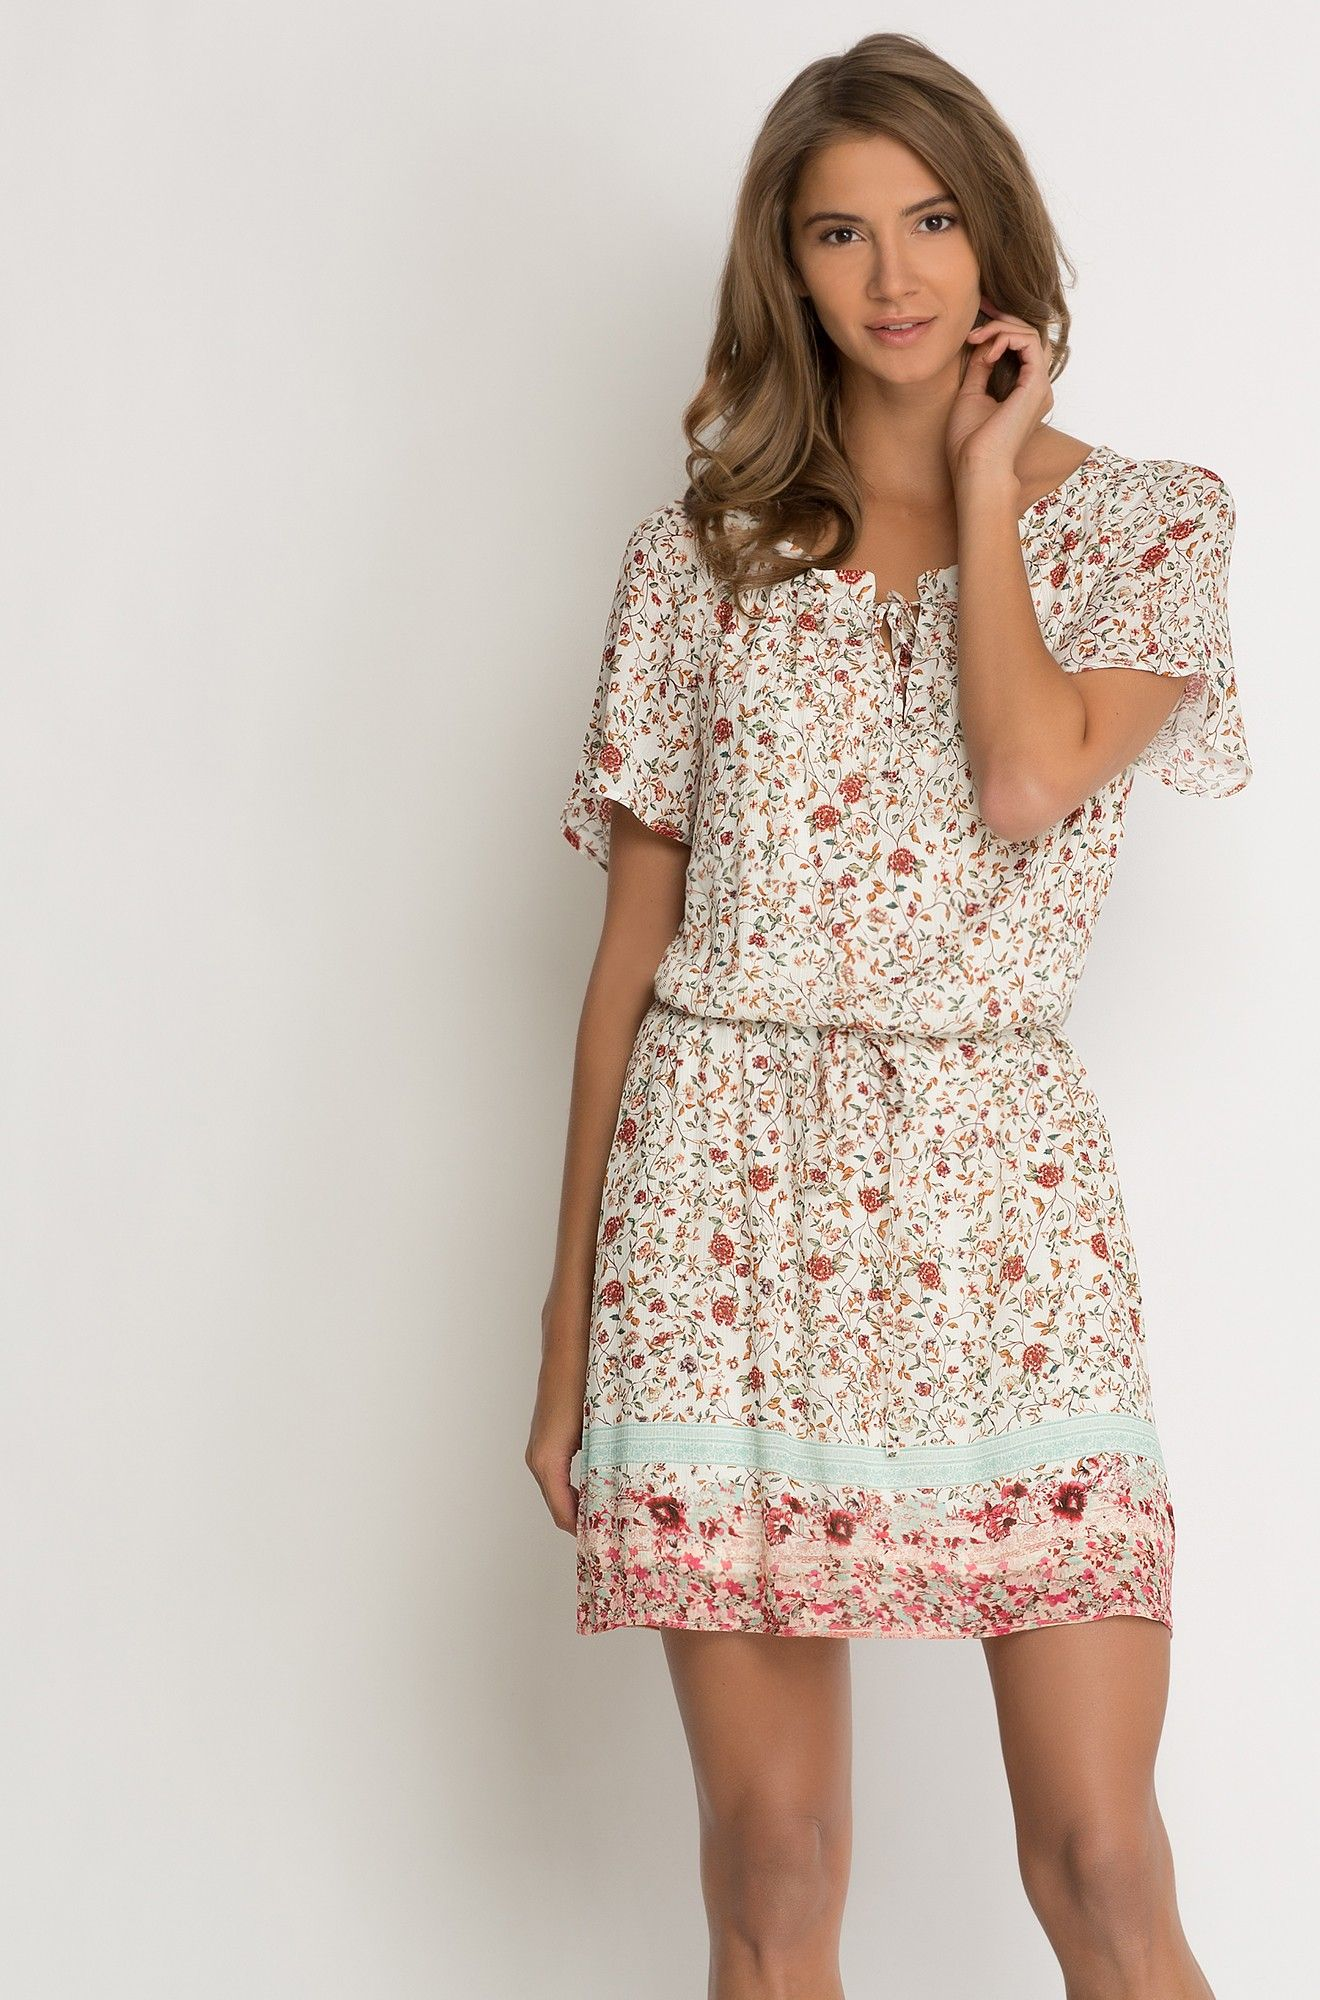 Virágmintás miniruha  Summer dresses, Fashion, Dresses